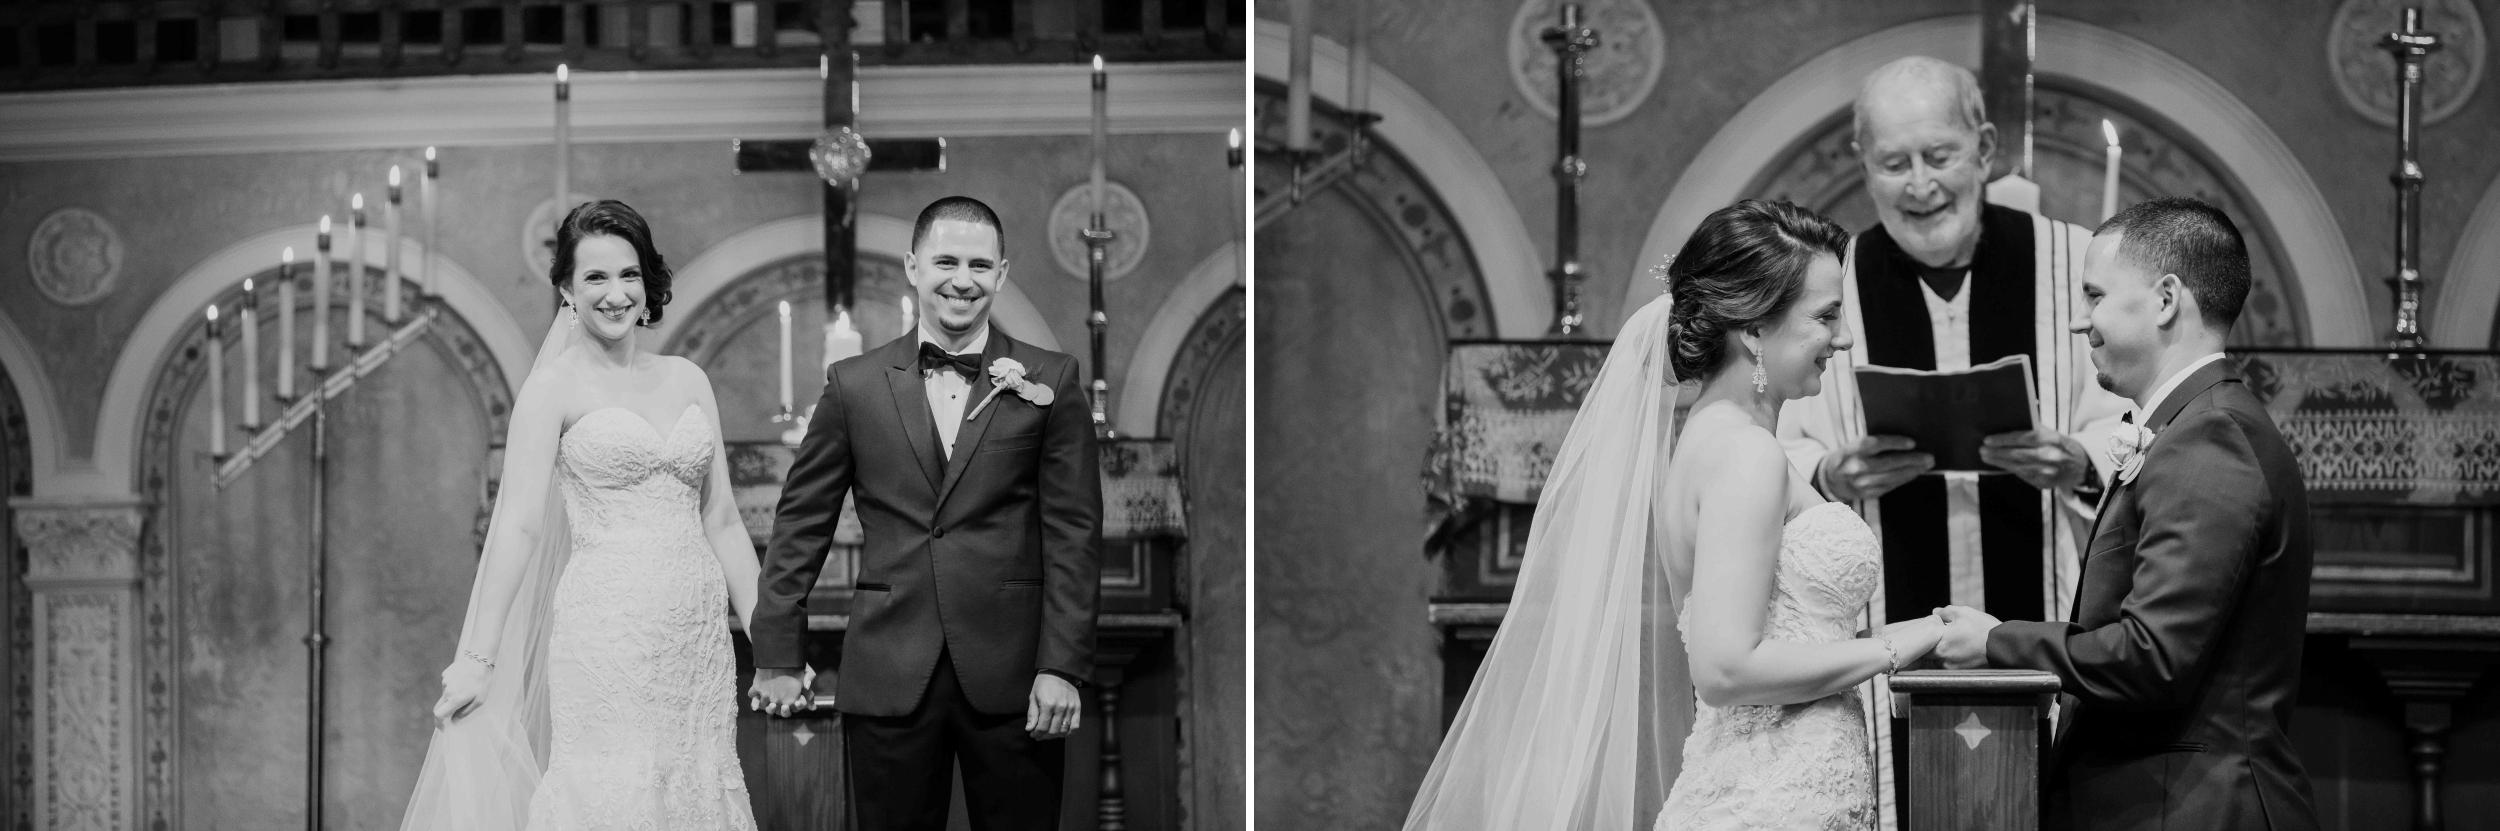 Wedding - Coco Plum - Coral Gables Congregational - Santy Martinez Photography 22.jpg